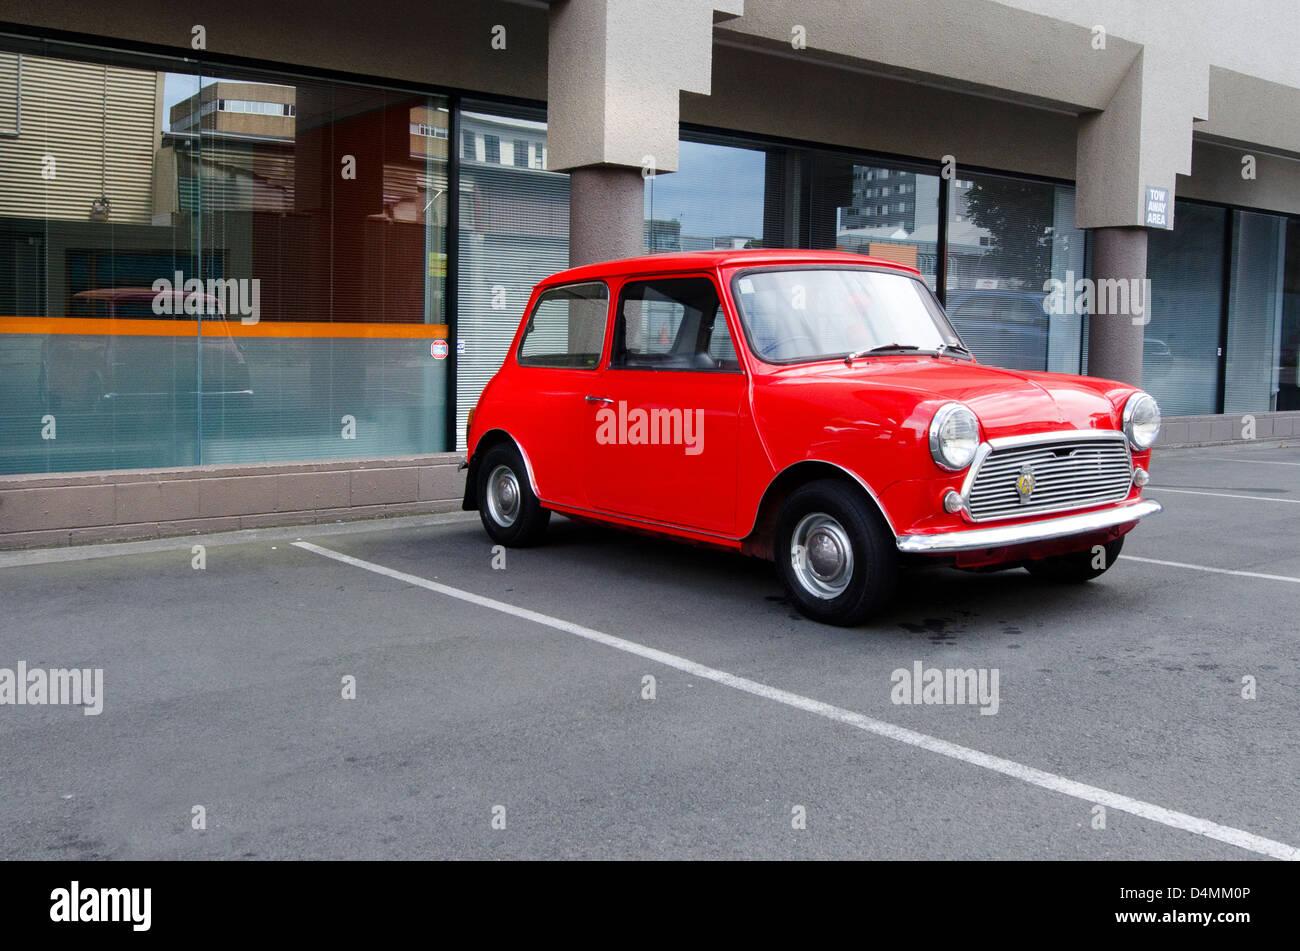 Classic mini model in a car parking lot. - Stock Image